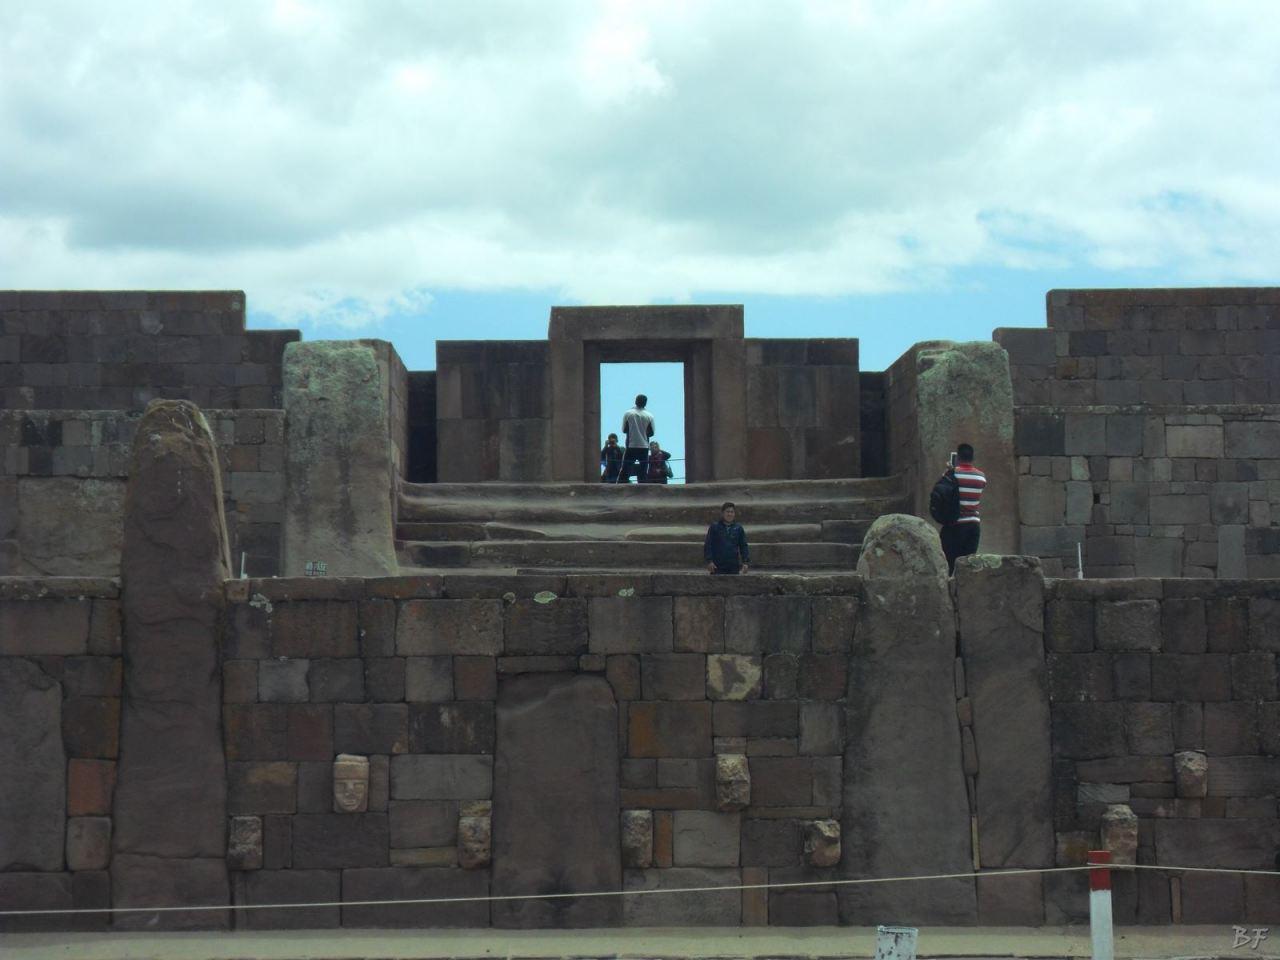 Sito-Megalitico-Piramide-Akapana-Kalasasaya-Menhir-Tiahuanaco-Bolivia-91